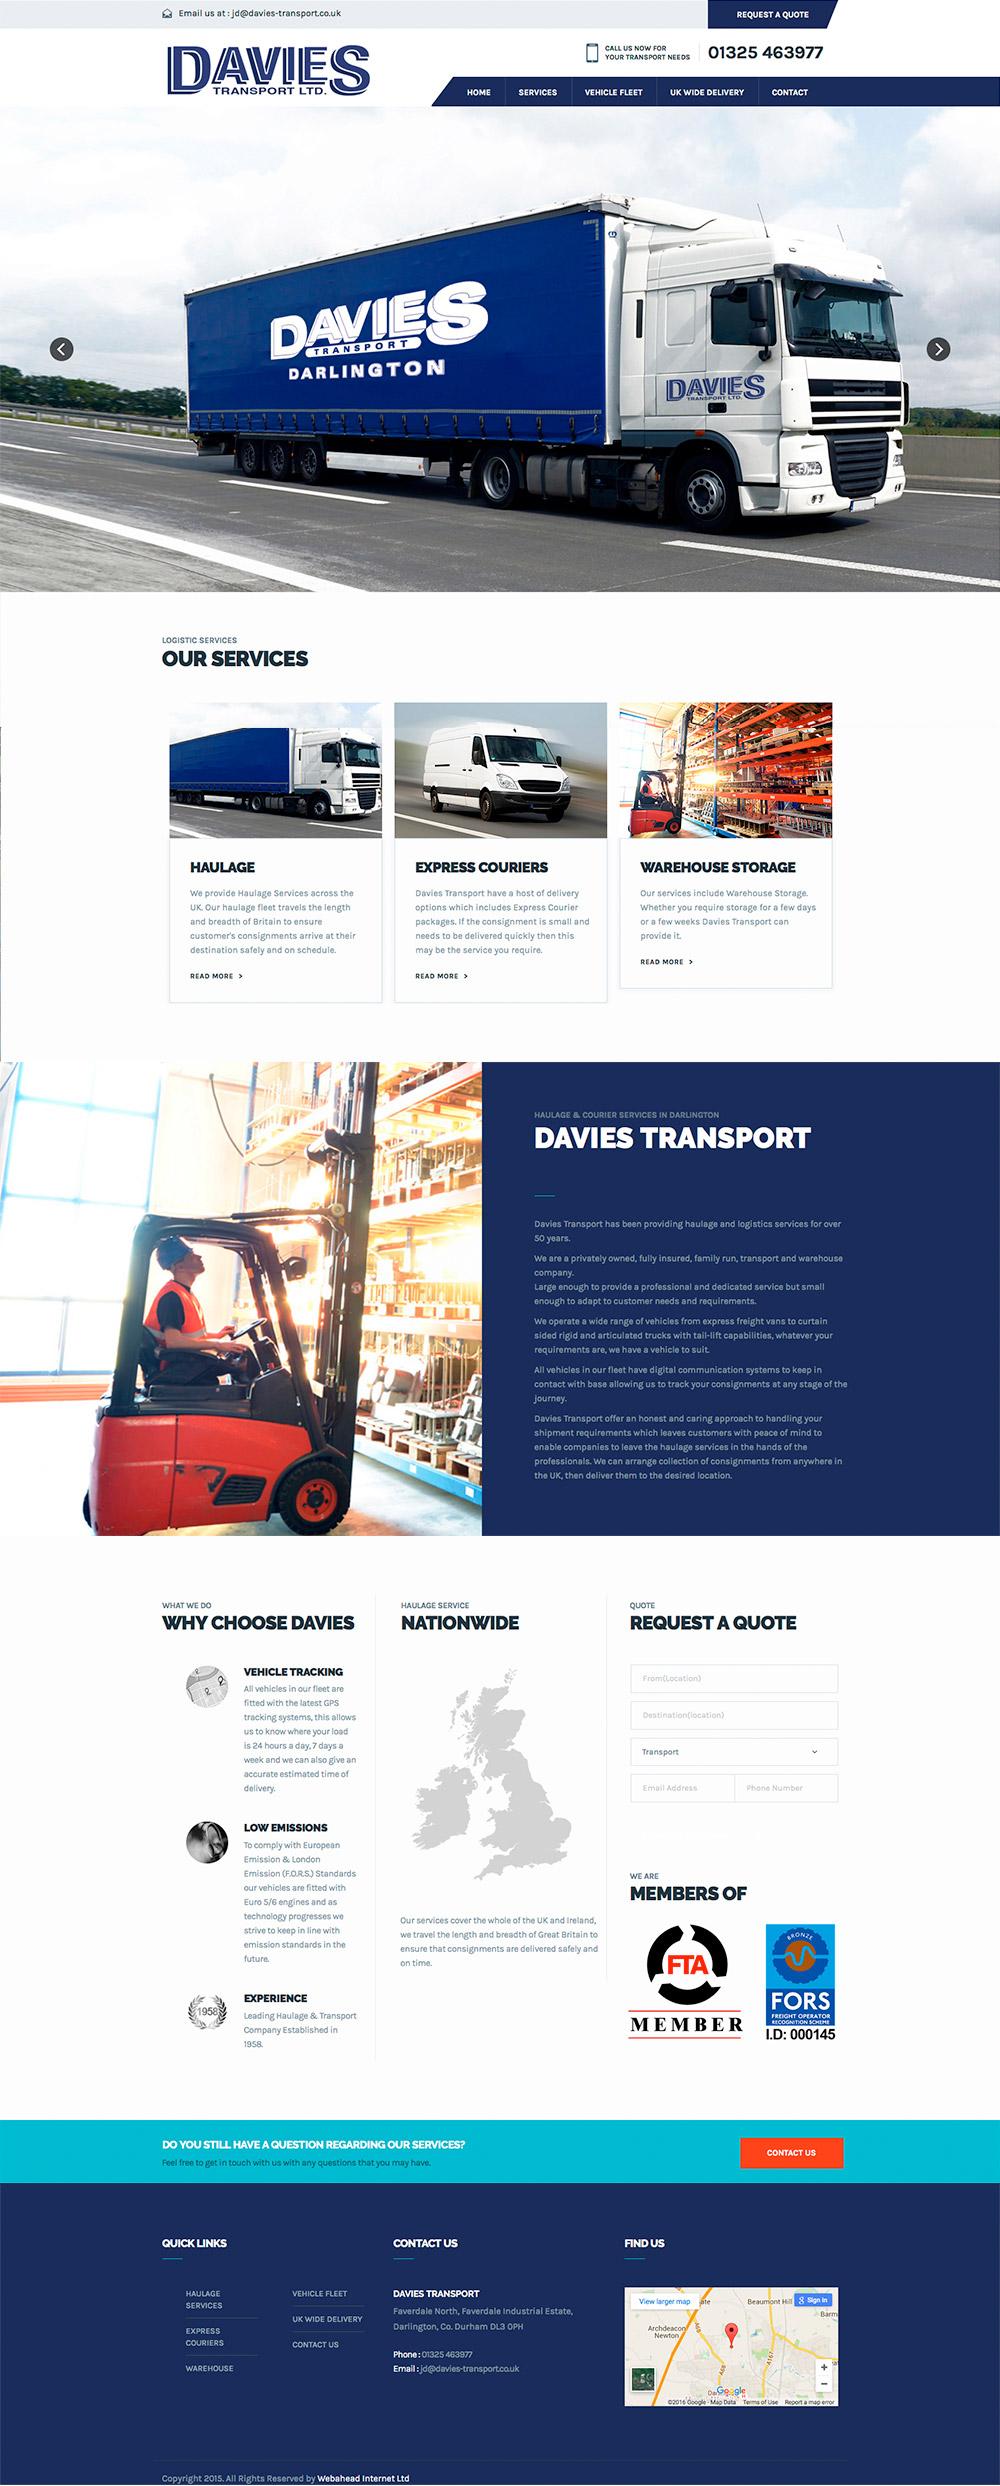 davies_transport